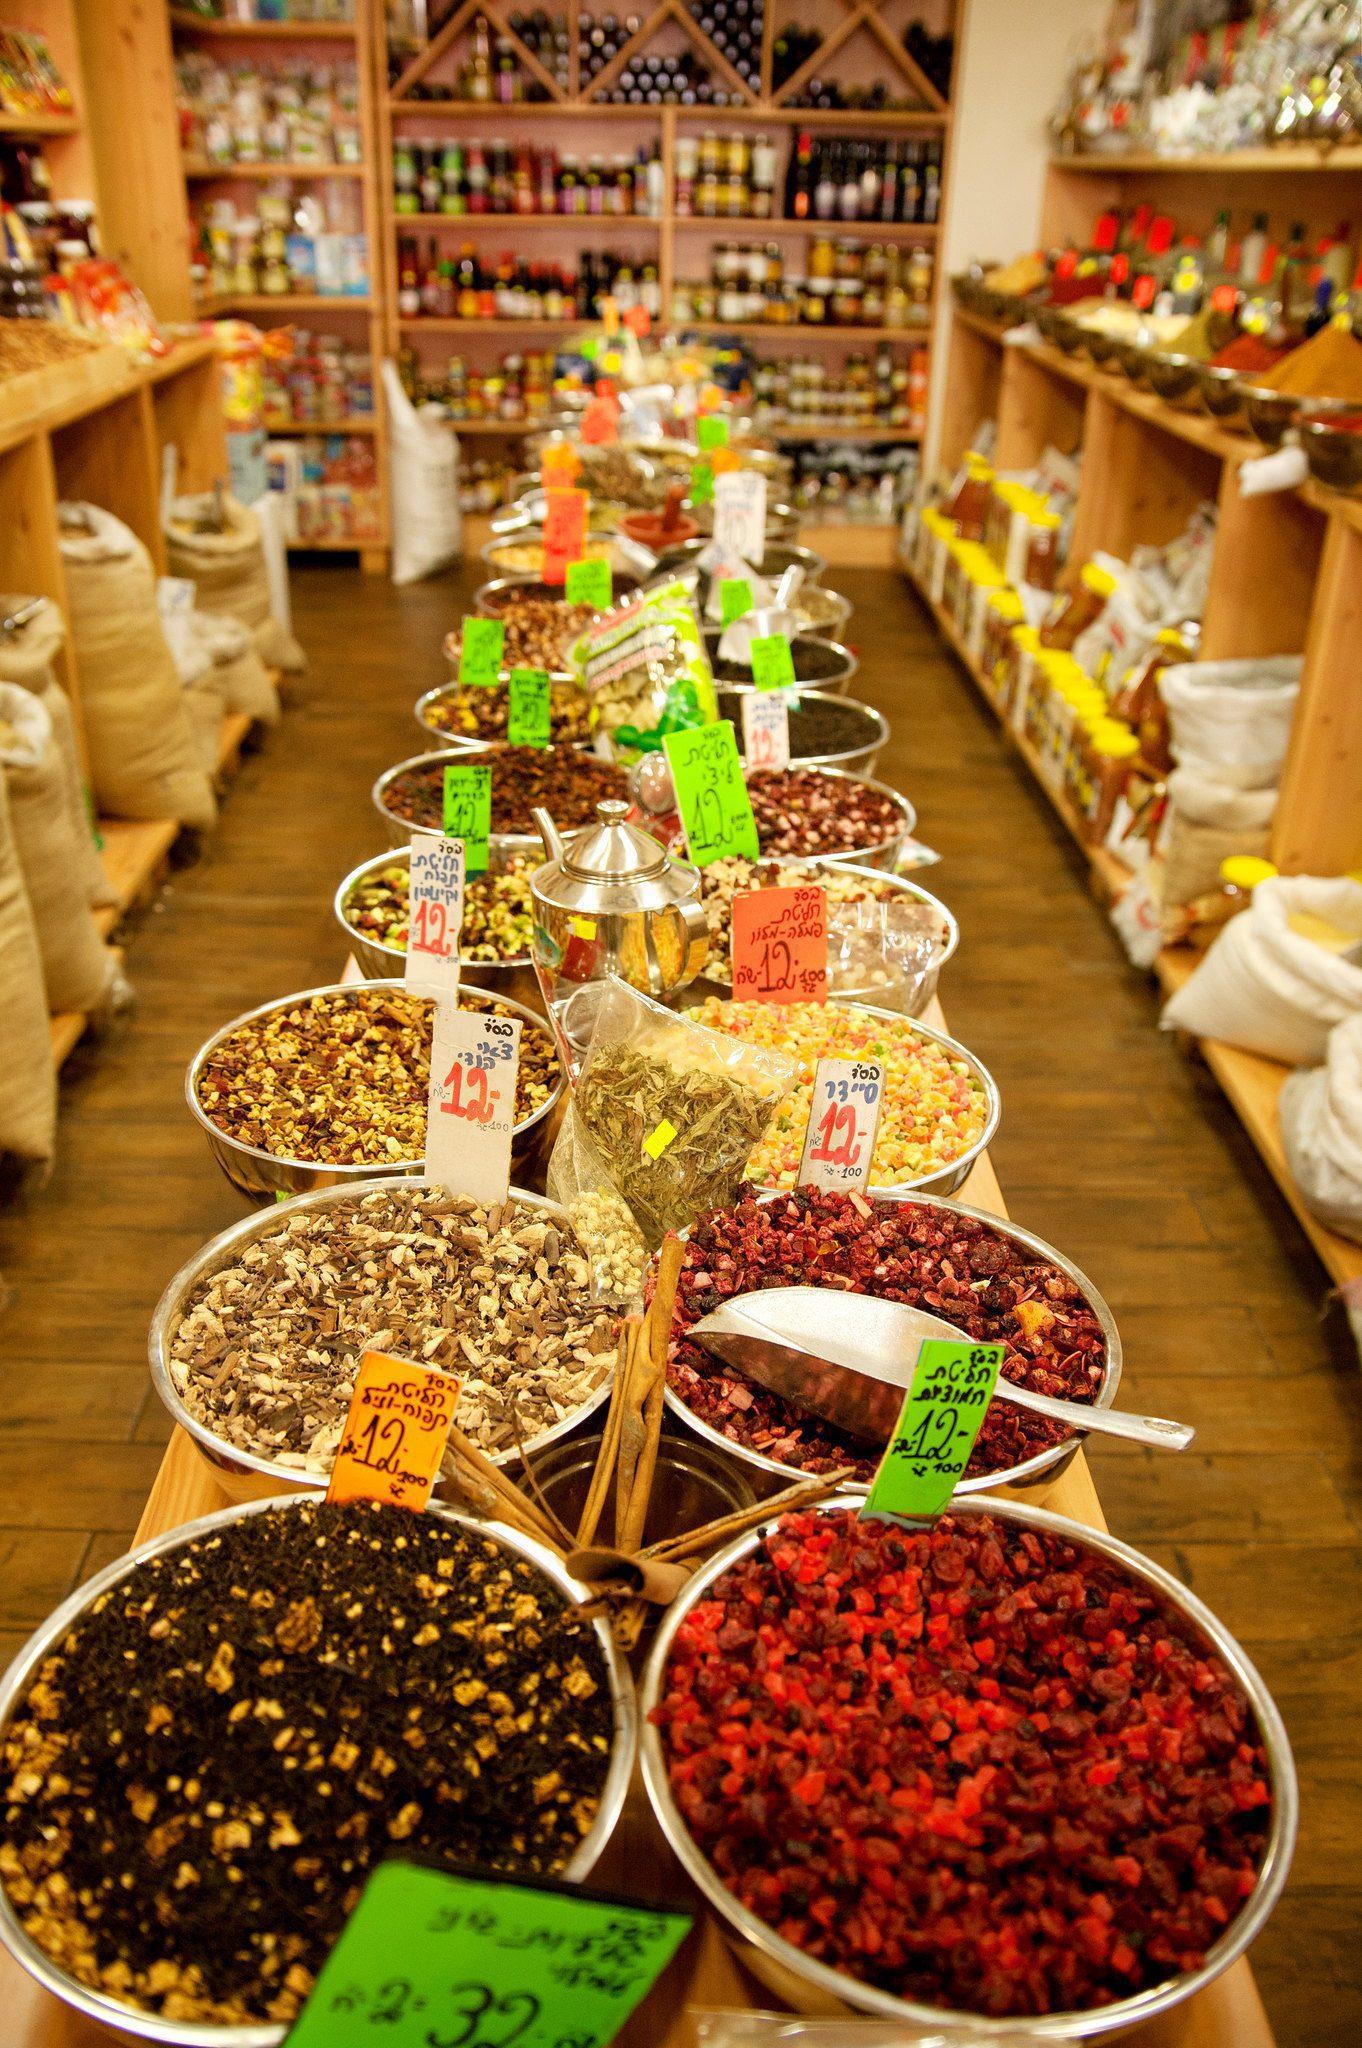 Spices in market of Jerusalem